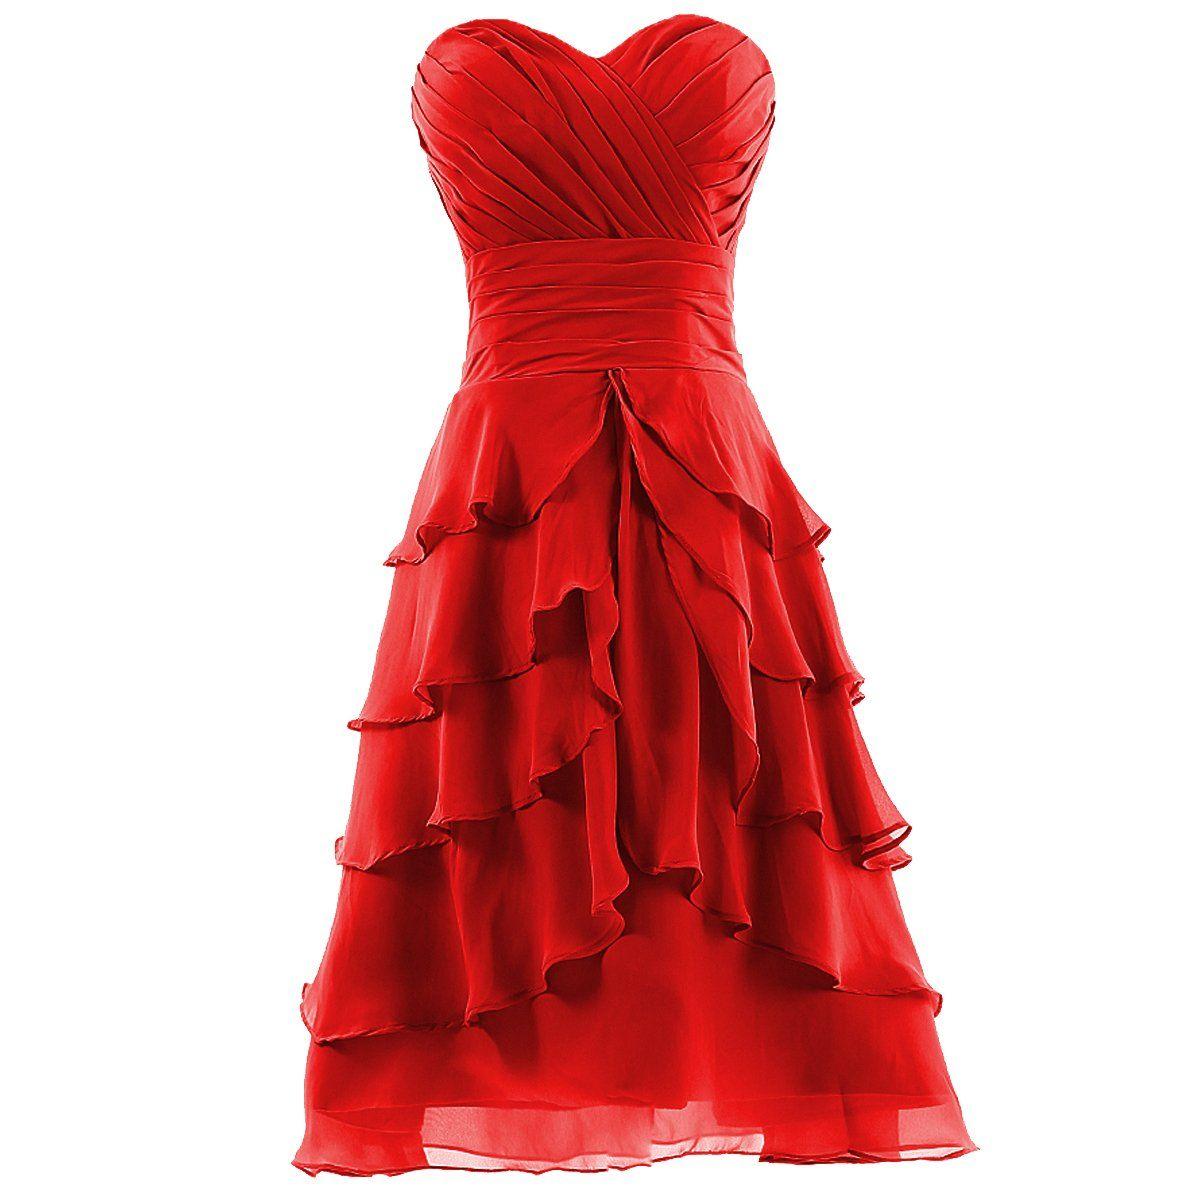 Dresstells womenus sweetheart kneelength chiffon short bridesmaid